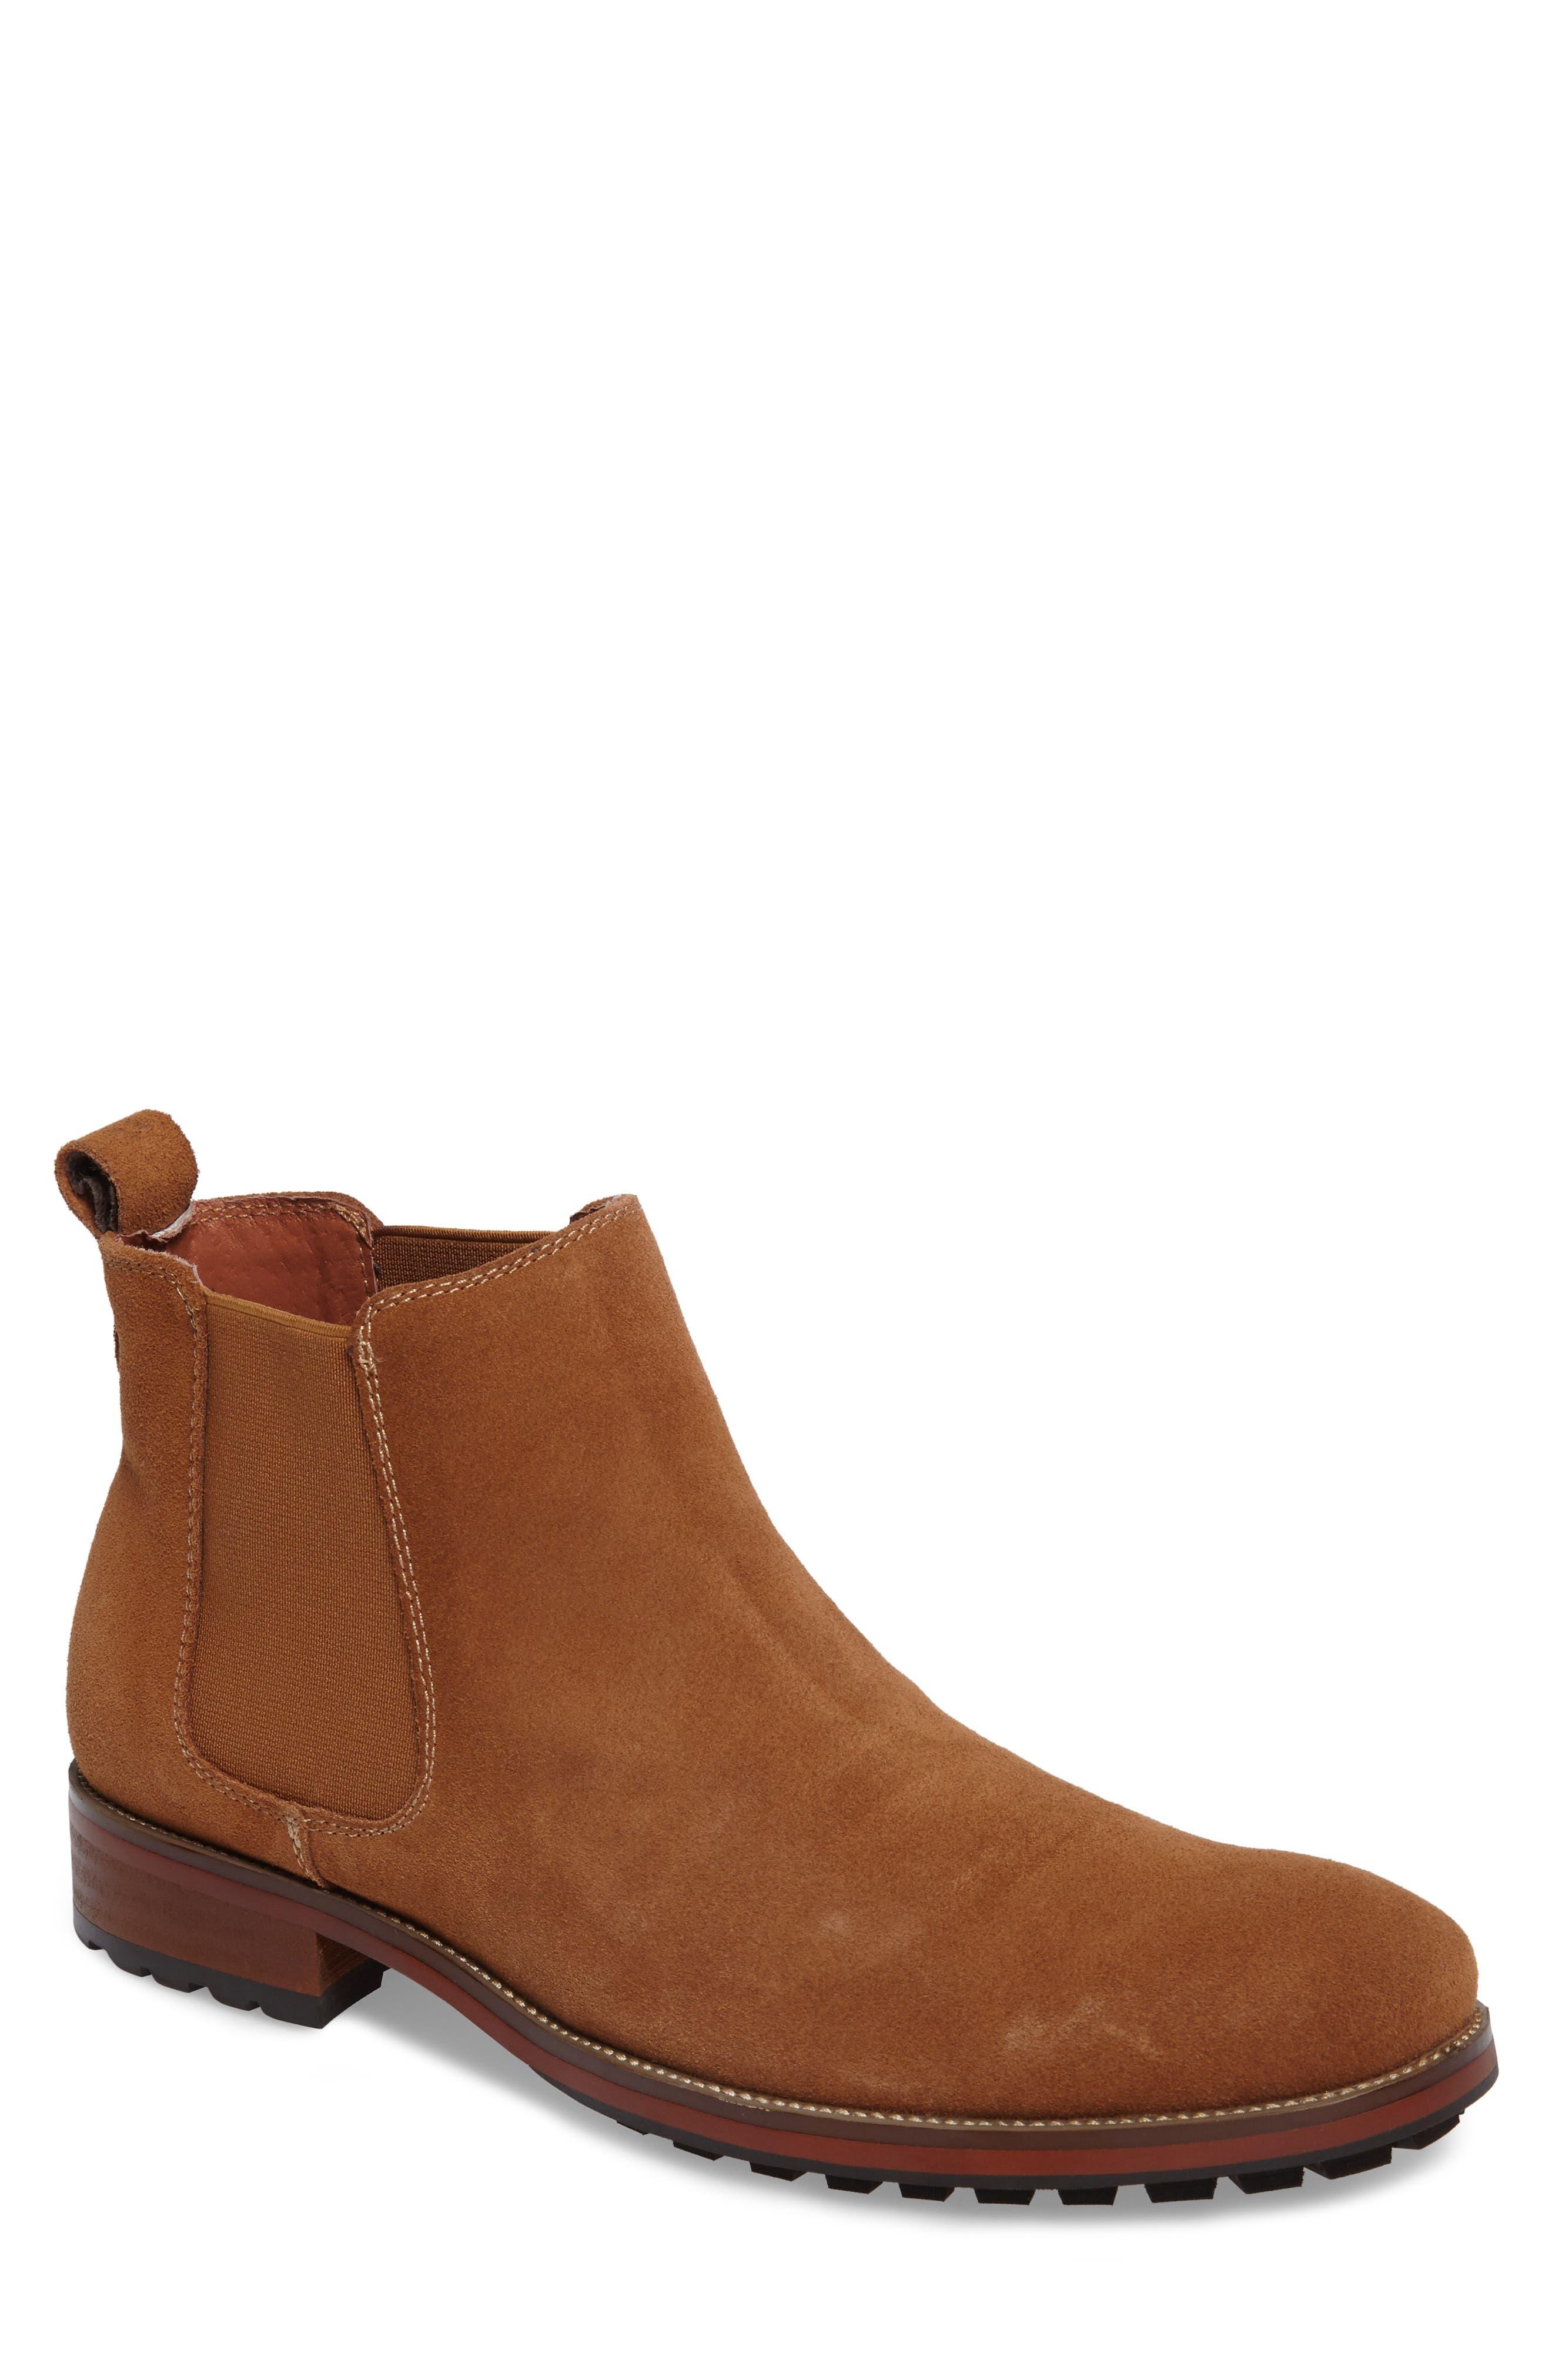 Main Image - Jump Carson Chelsea Boot (Men)